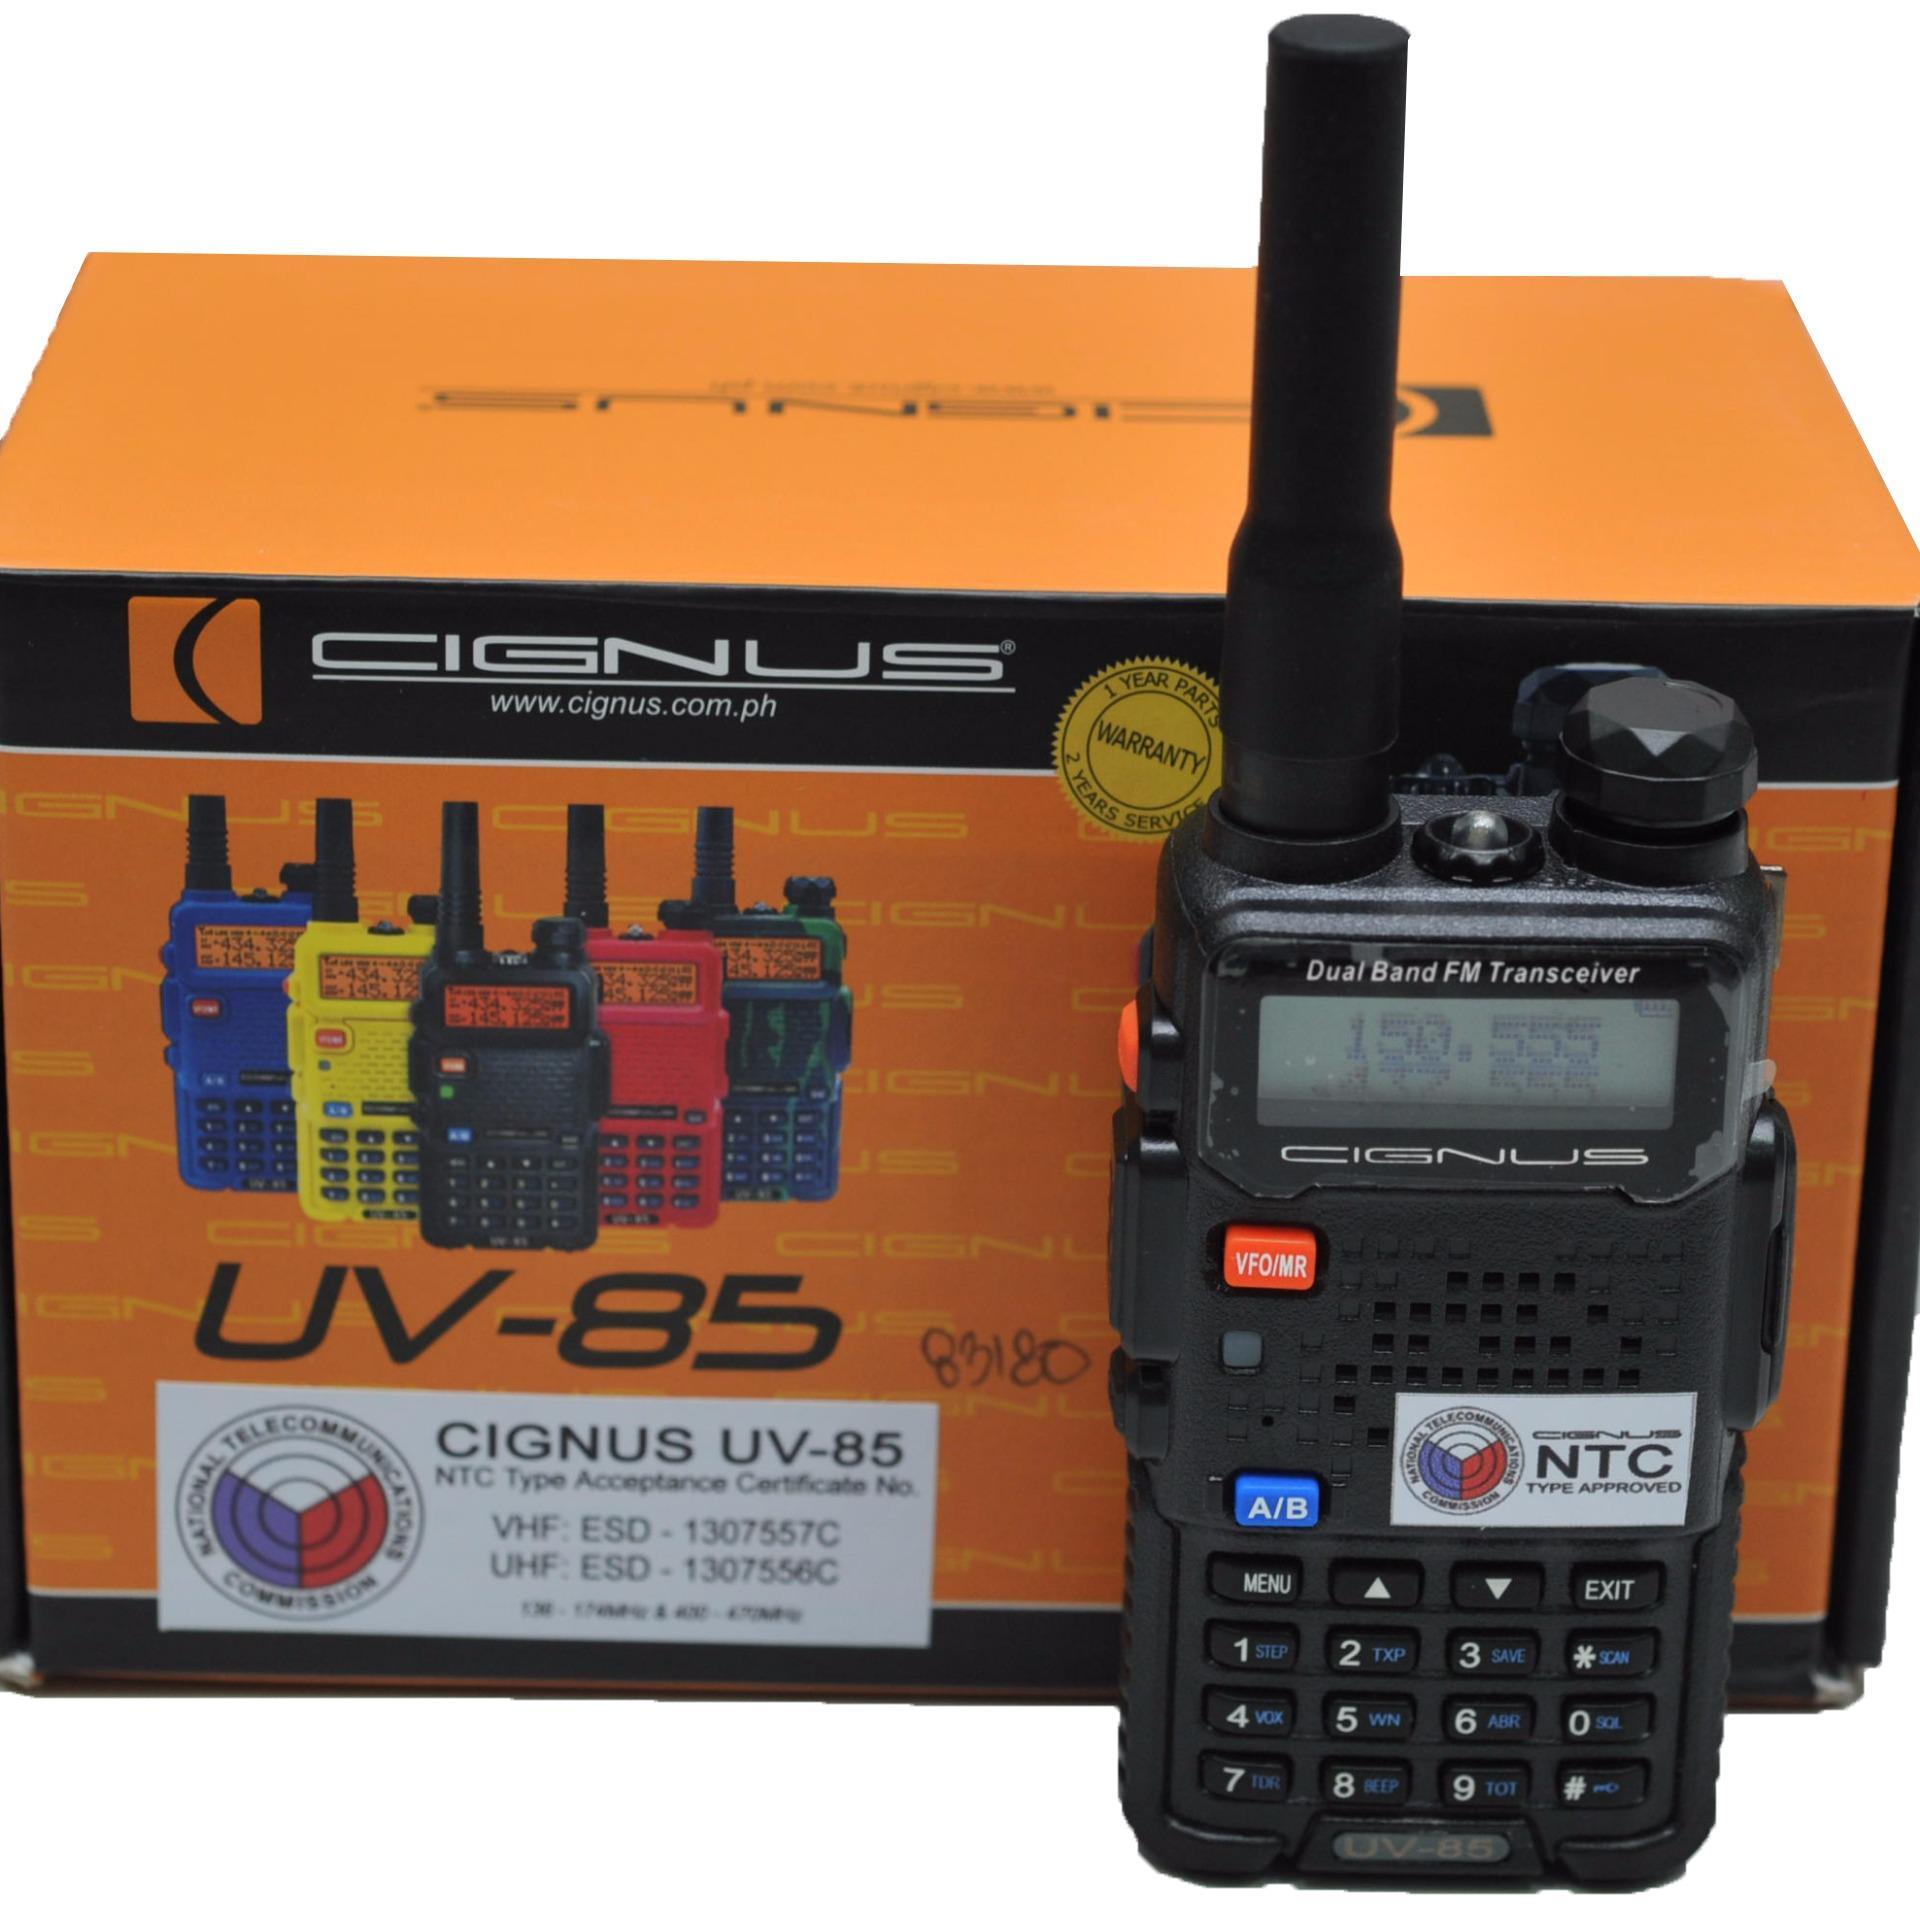 CIGNUS UV85 PORTABLE TWO WAY RADIO